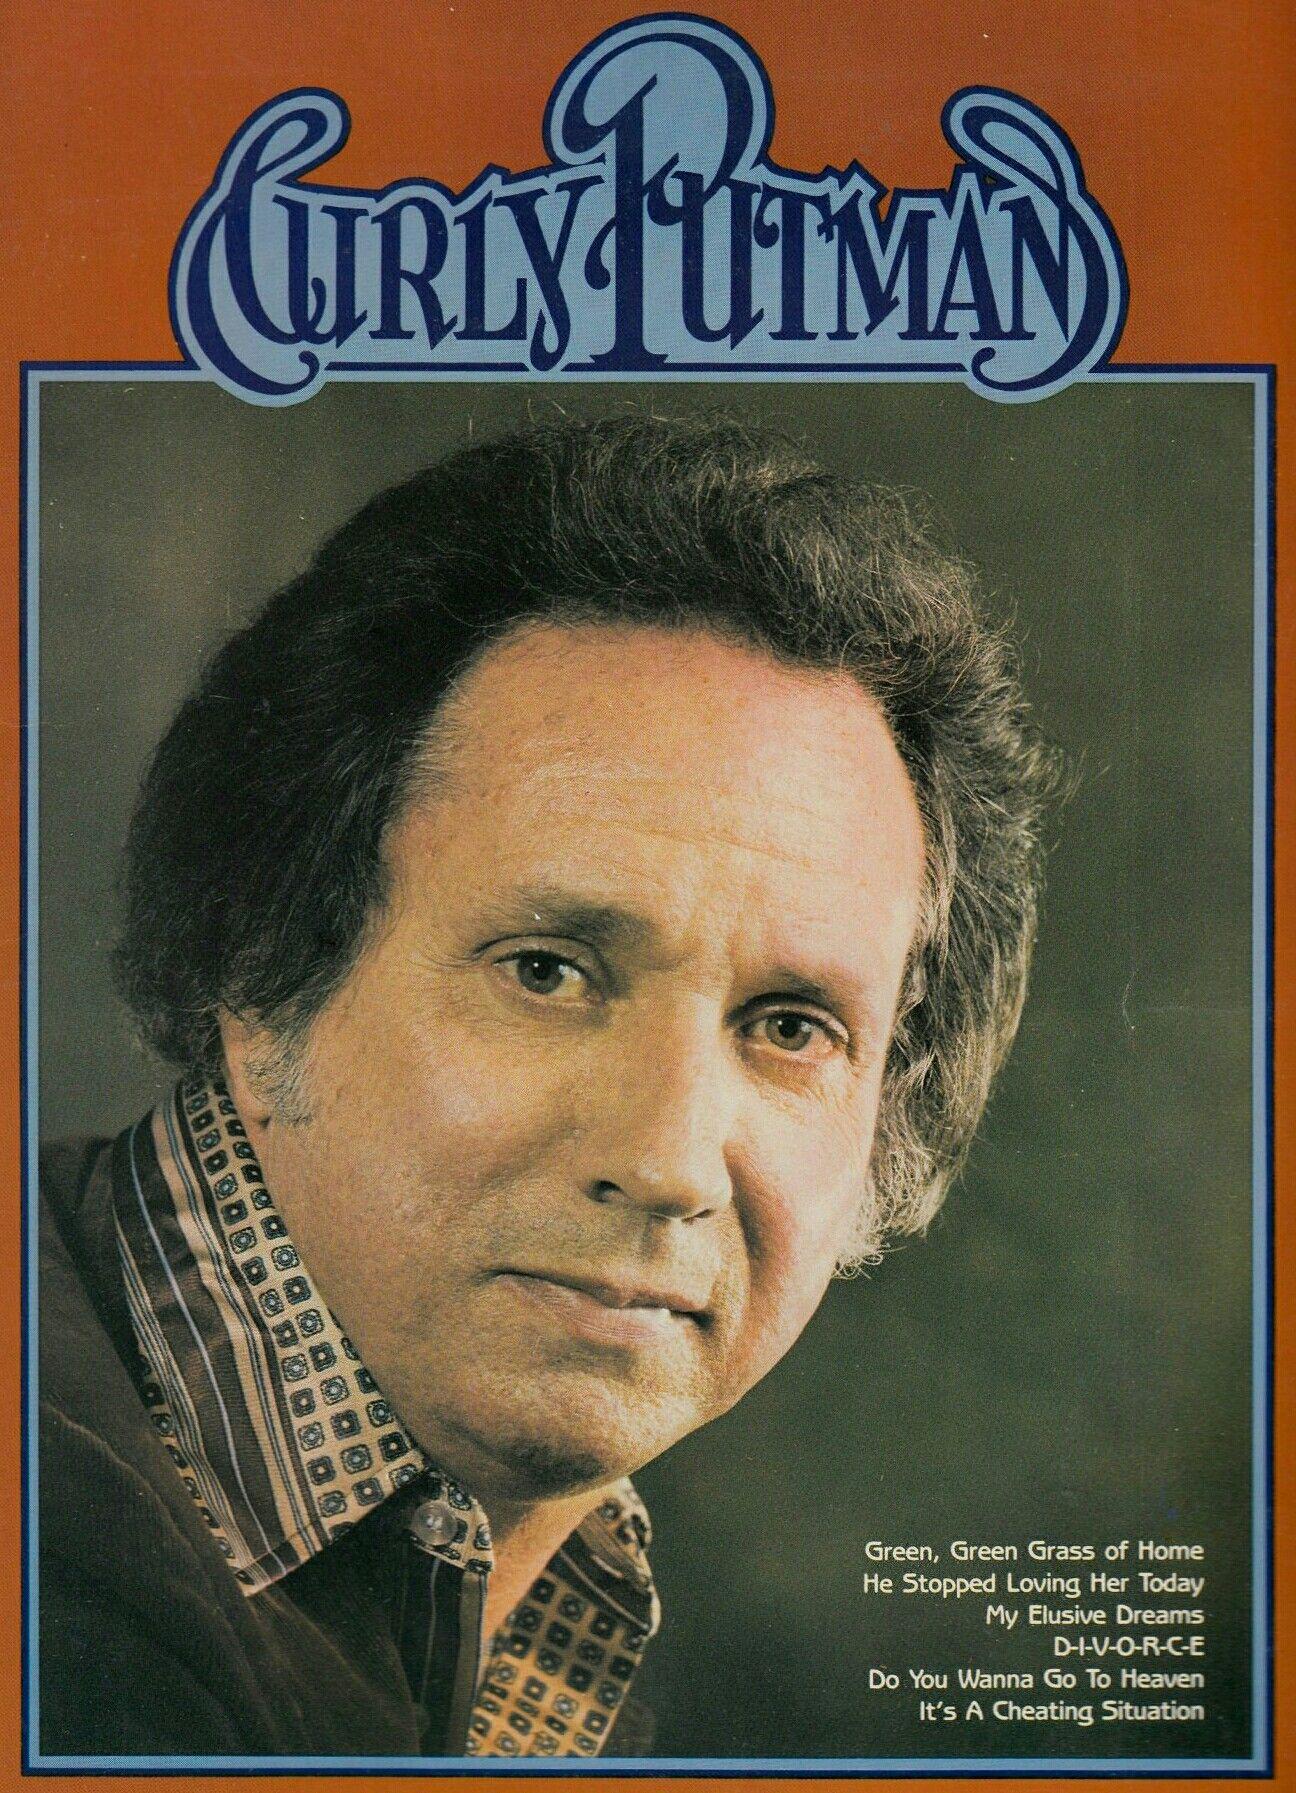 Curly putman songwriter november 20 1930 october 30